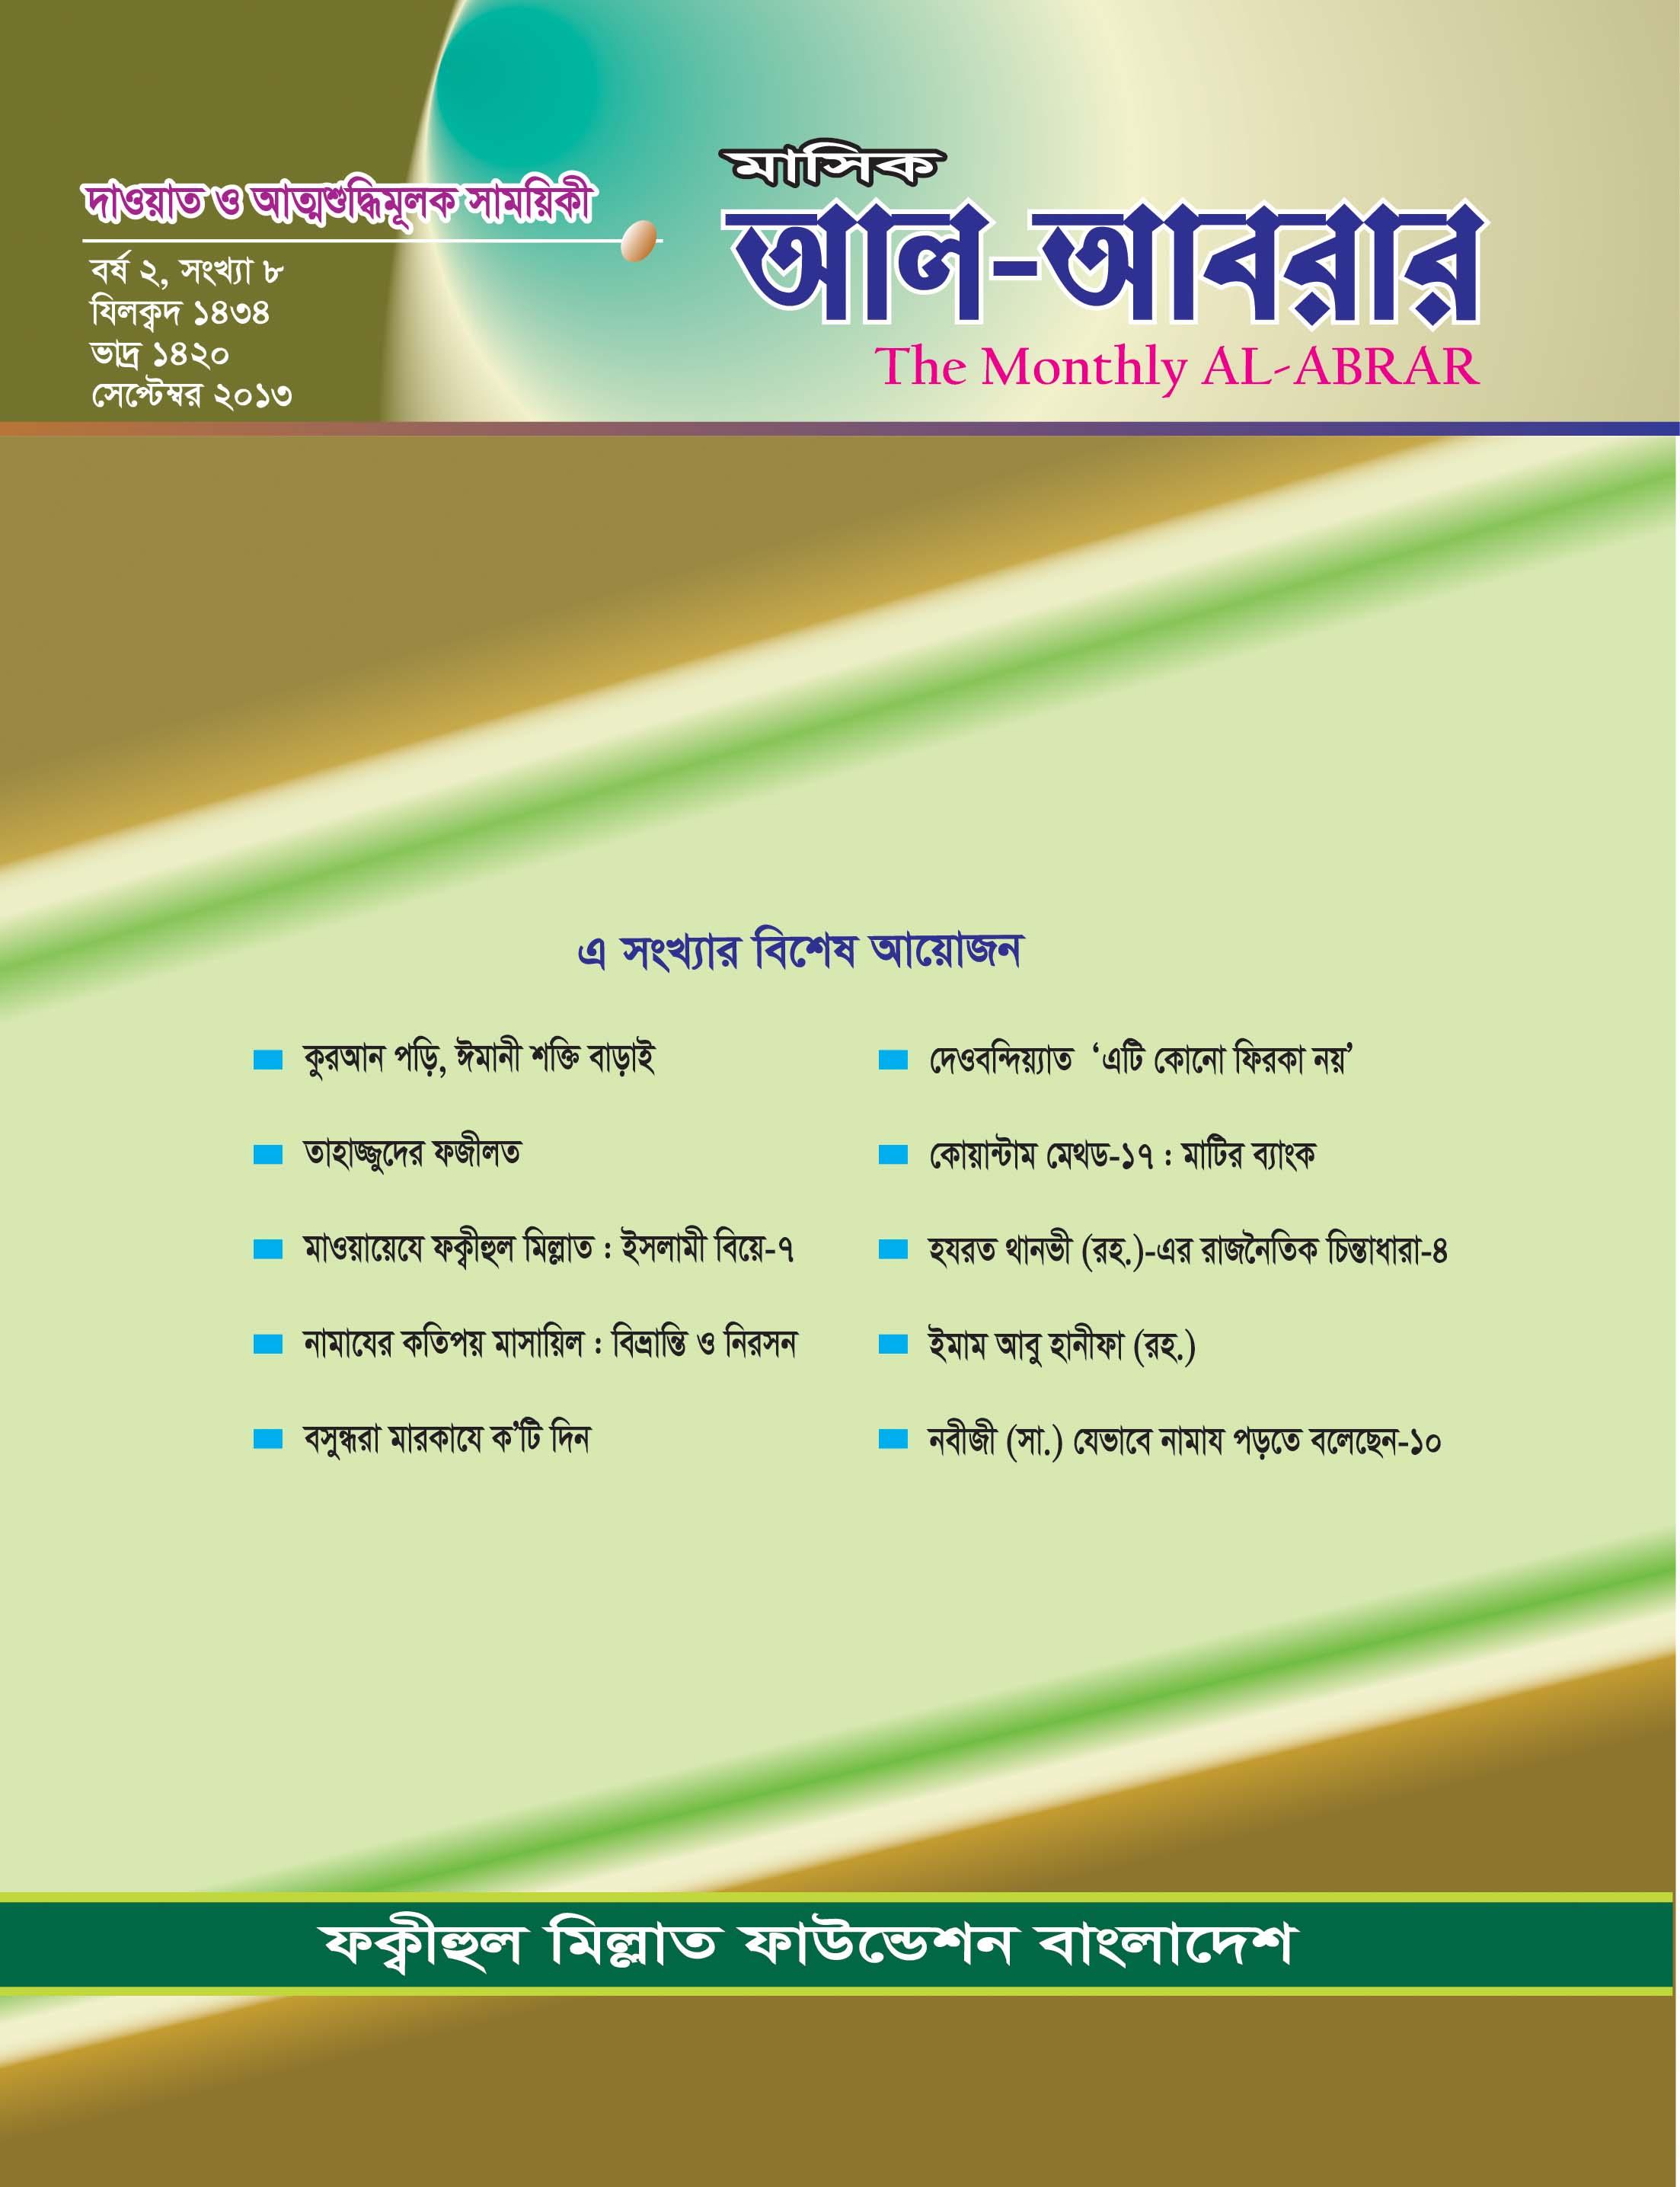 Cover Finel 9-2013-Fainal copy